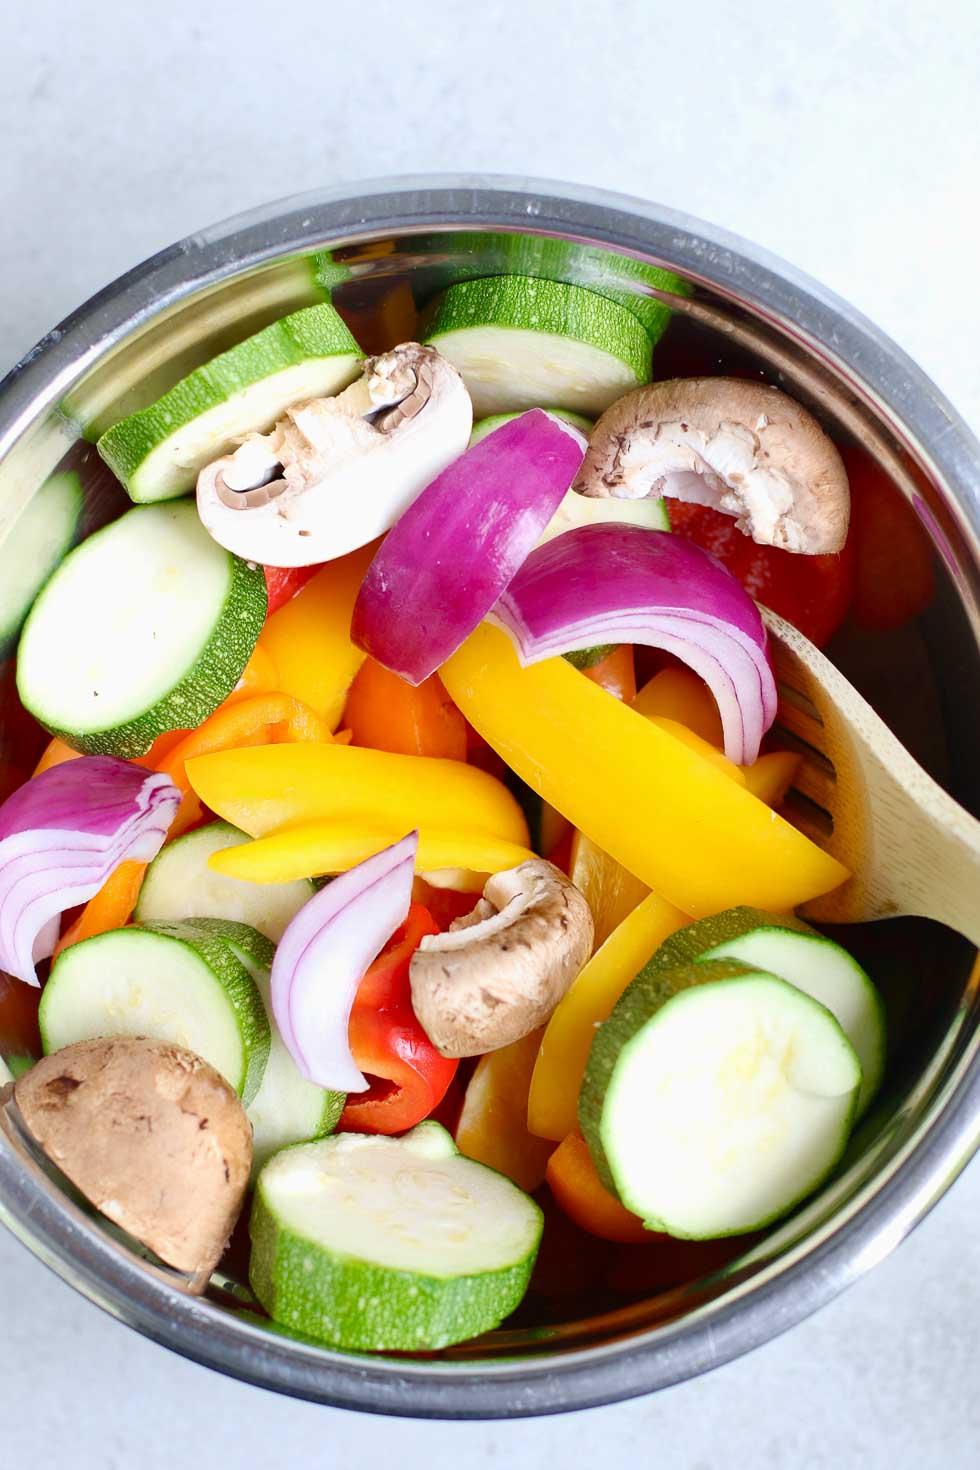 Stirring chopped vegetables